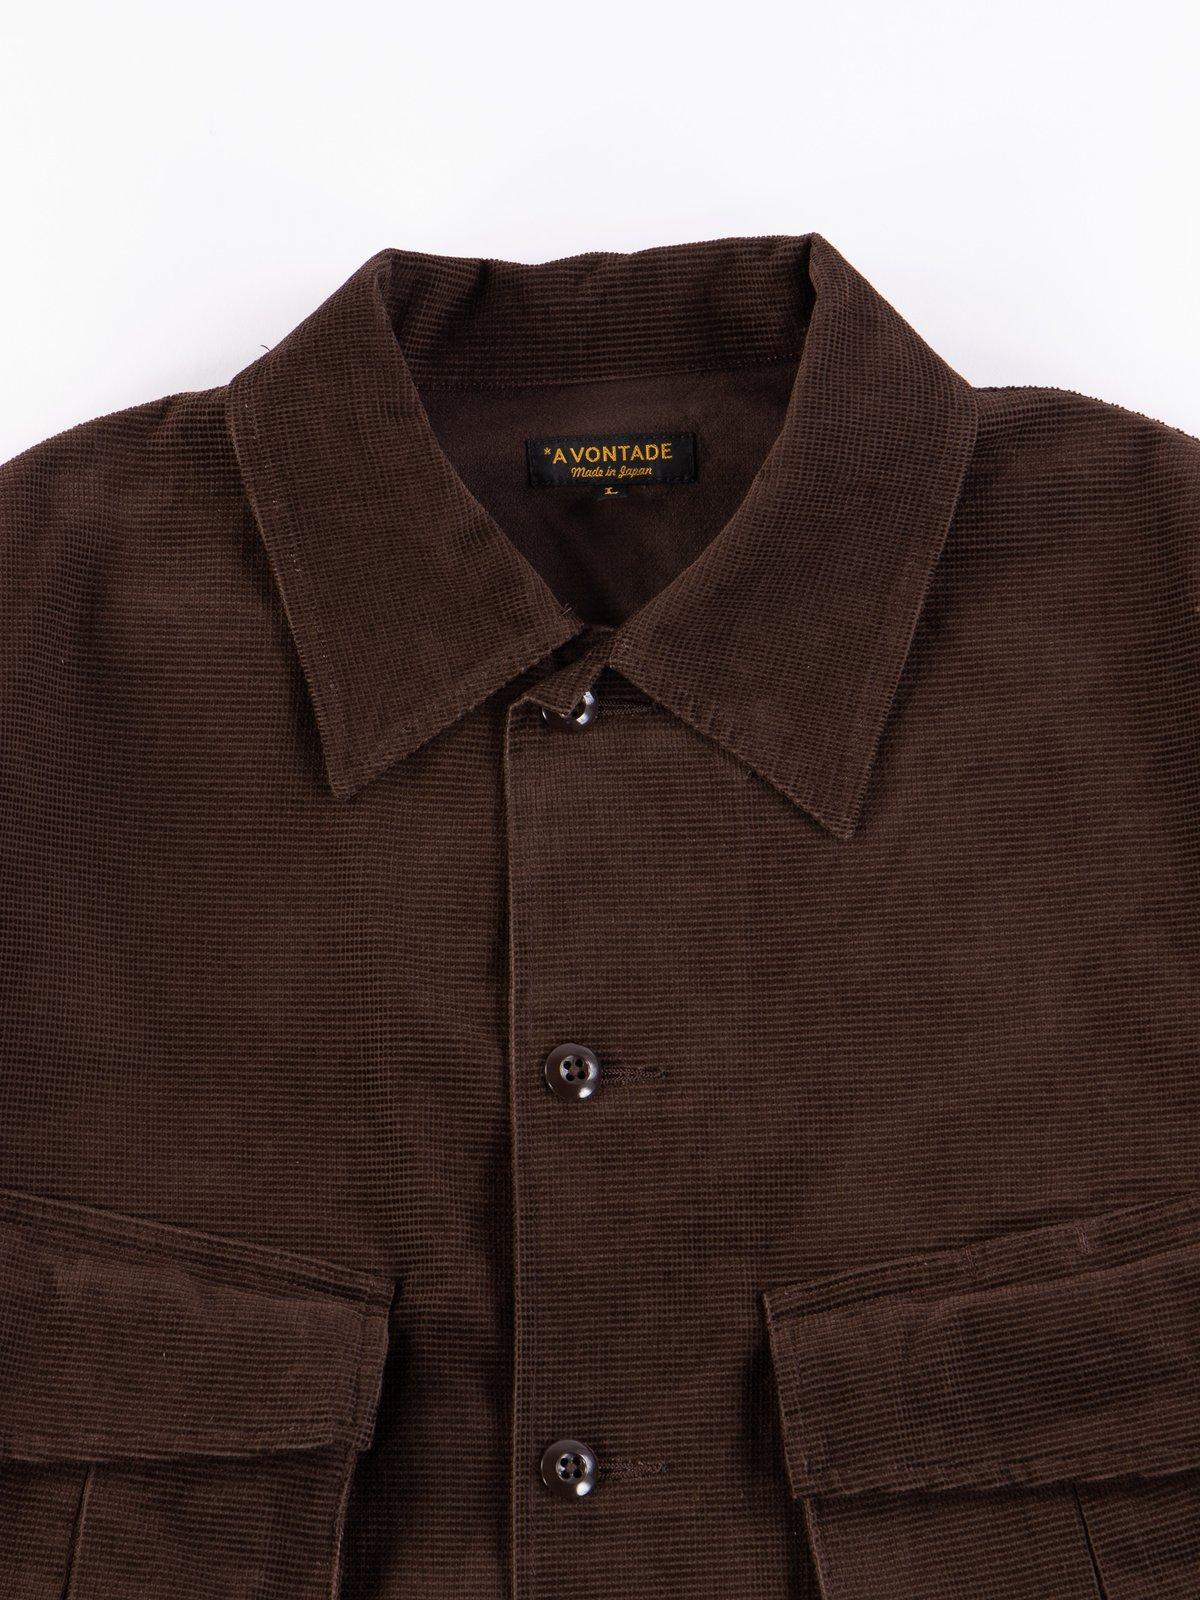 Dark Brown Dobby Caramel Corduroy Combat Short Jacket - Image 3